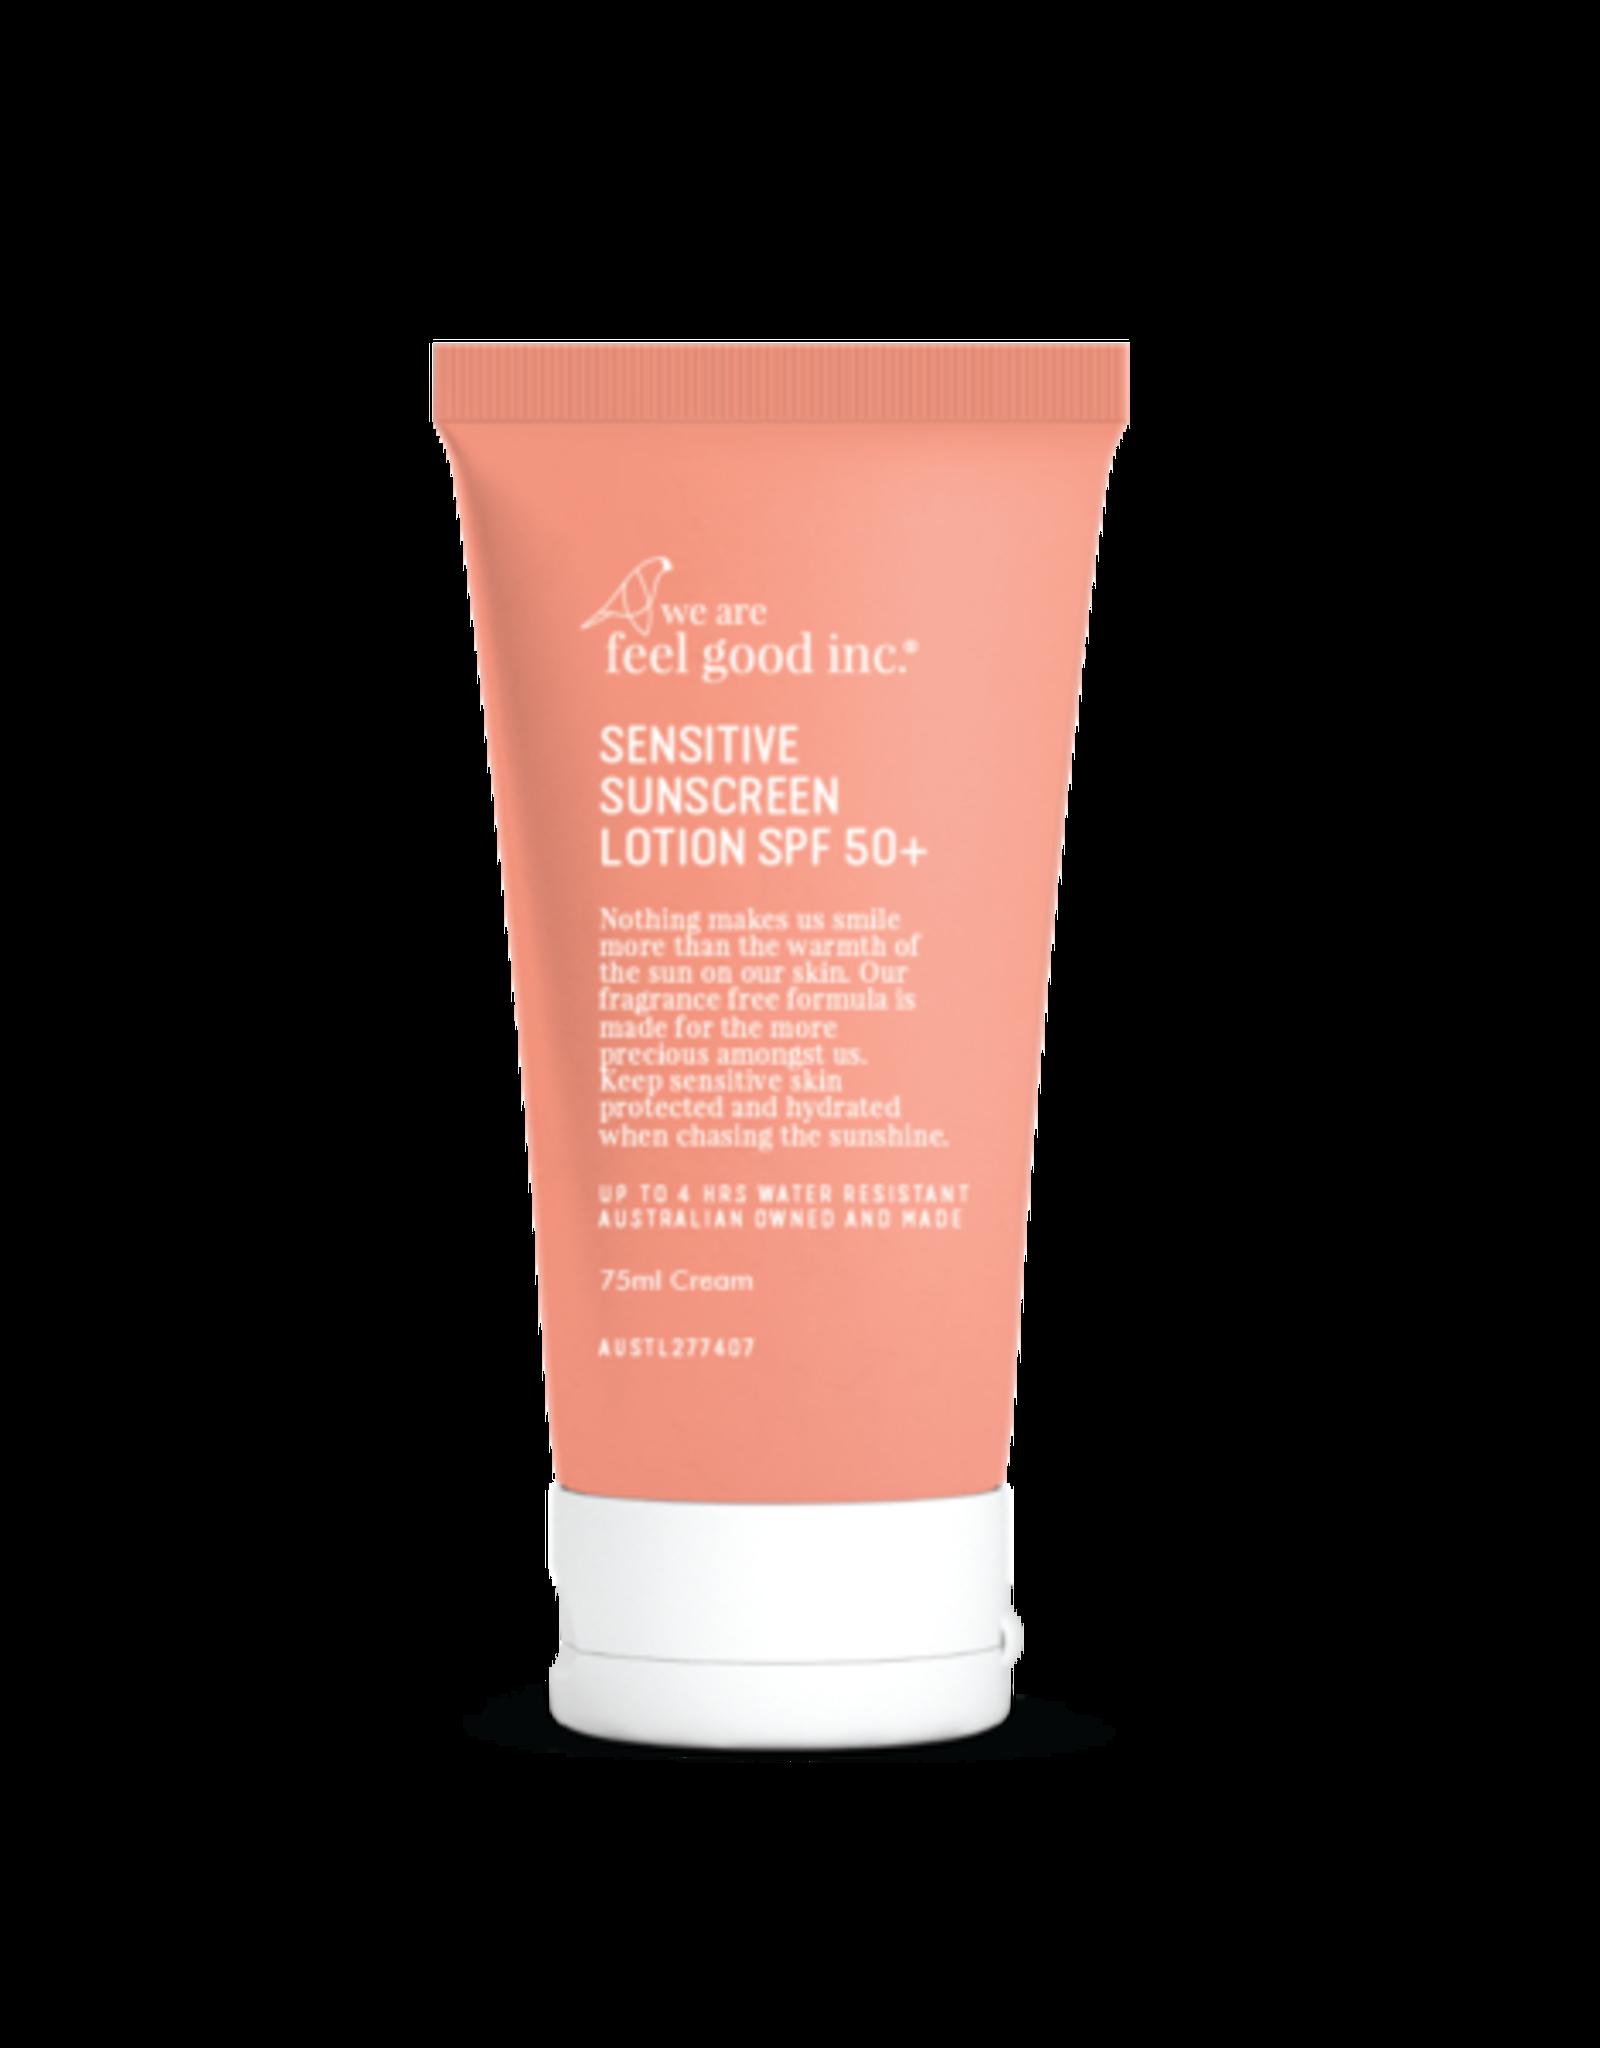 WE ARE FEEL GOOD INC Sensitive Sunscreen SPF50+ 75ml